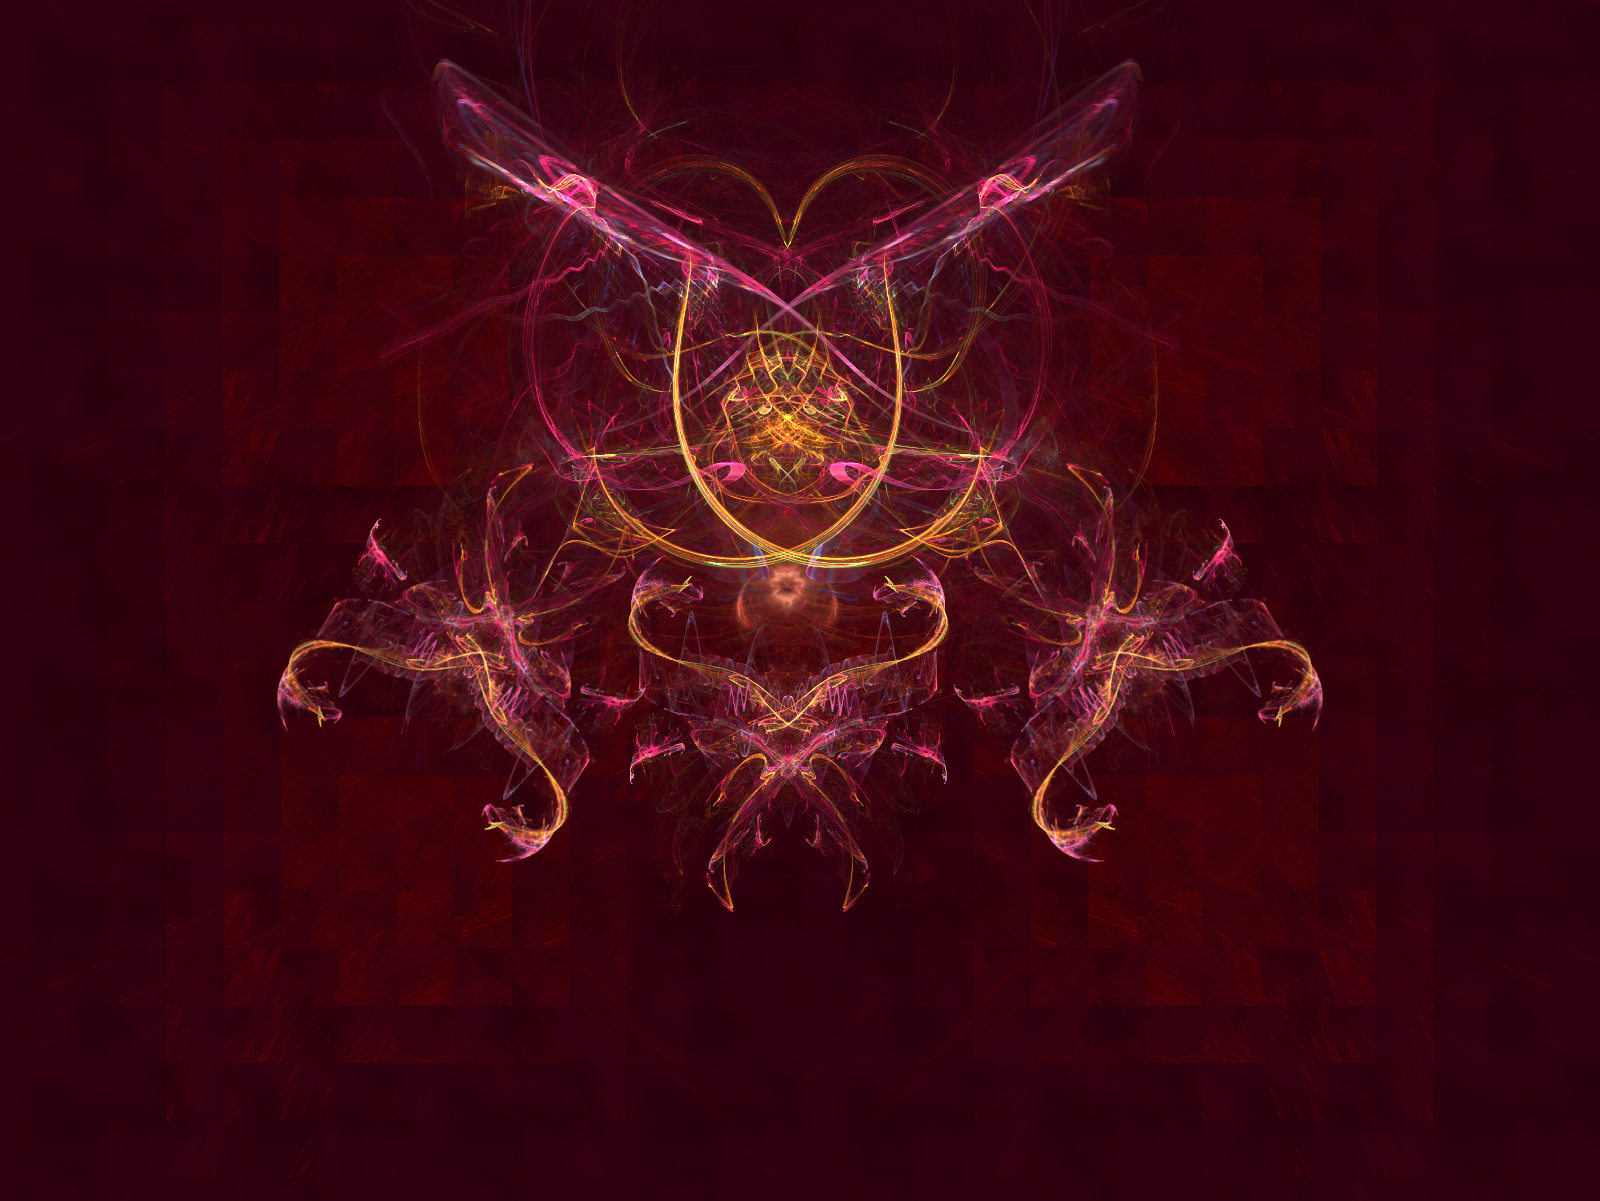 burgundy roses wallpaper beautiful hd desktop bacground image burgundy 1600x1201